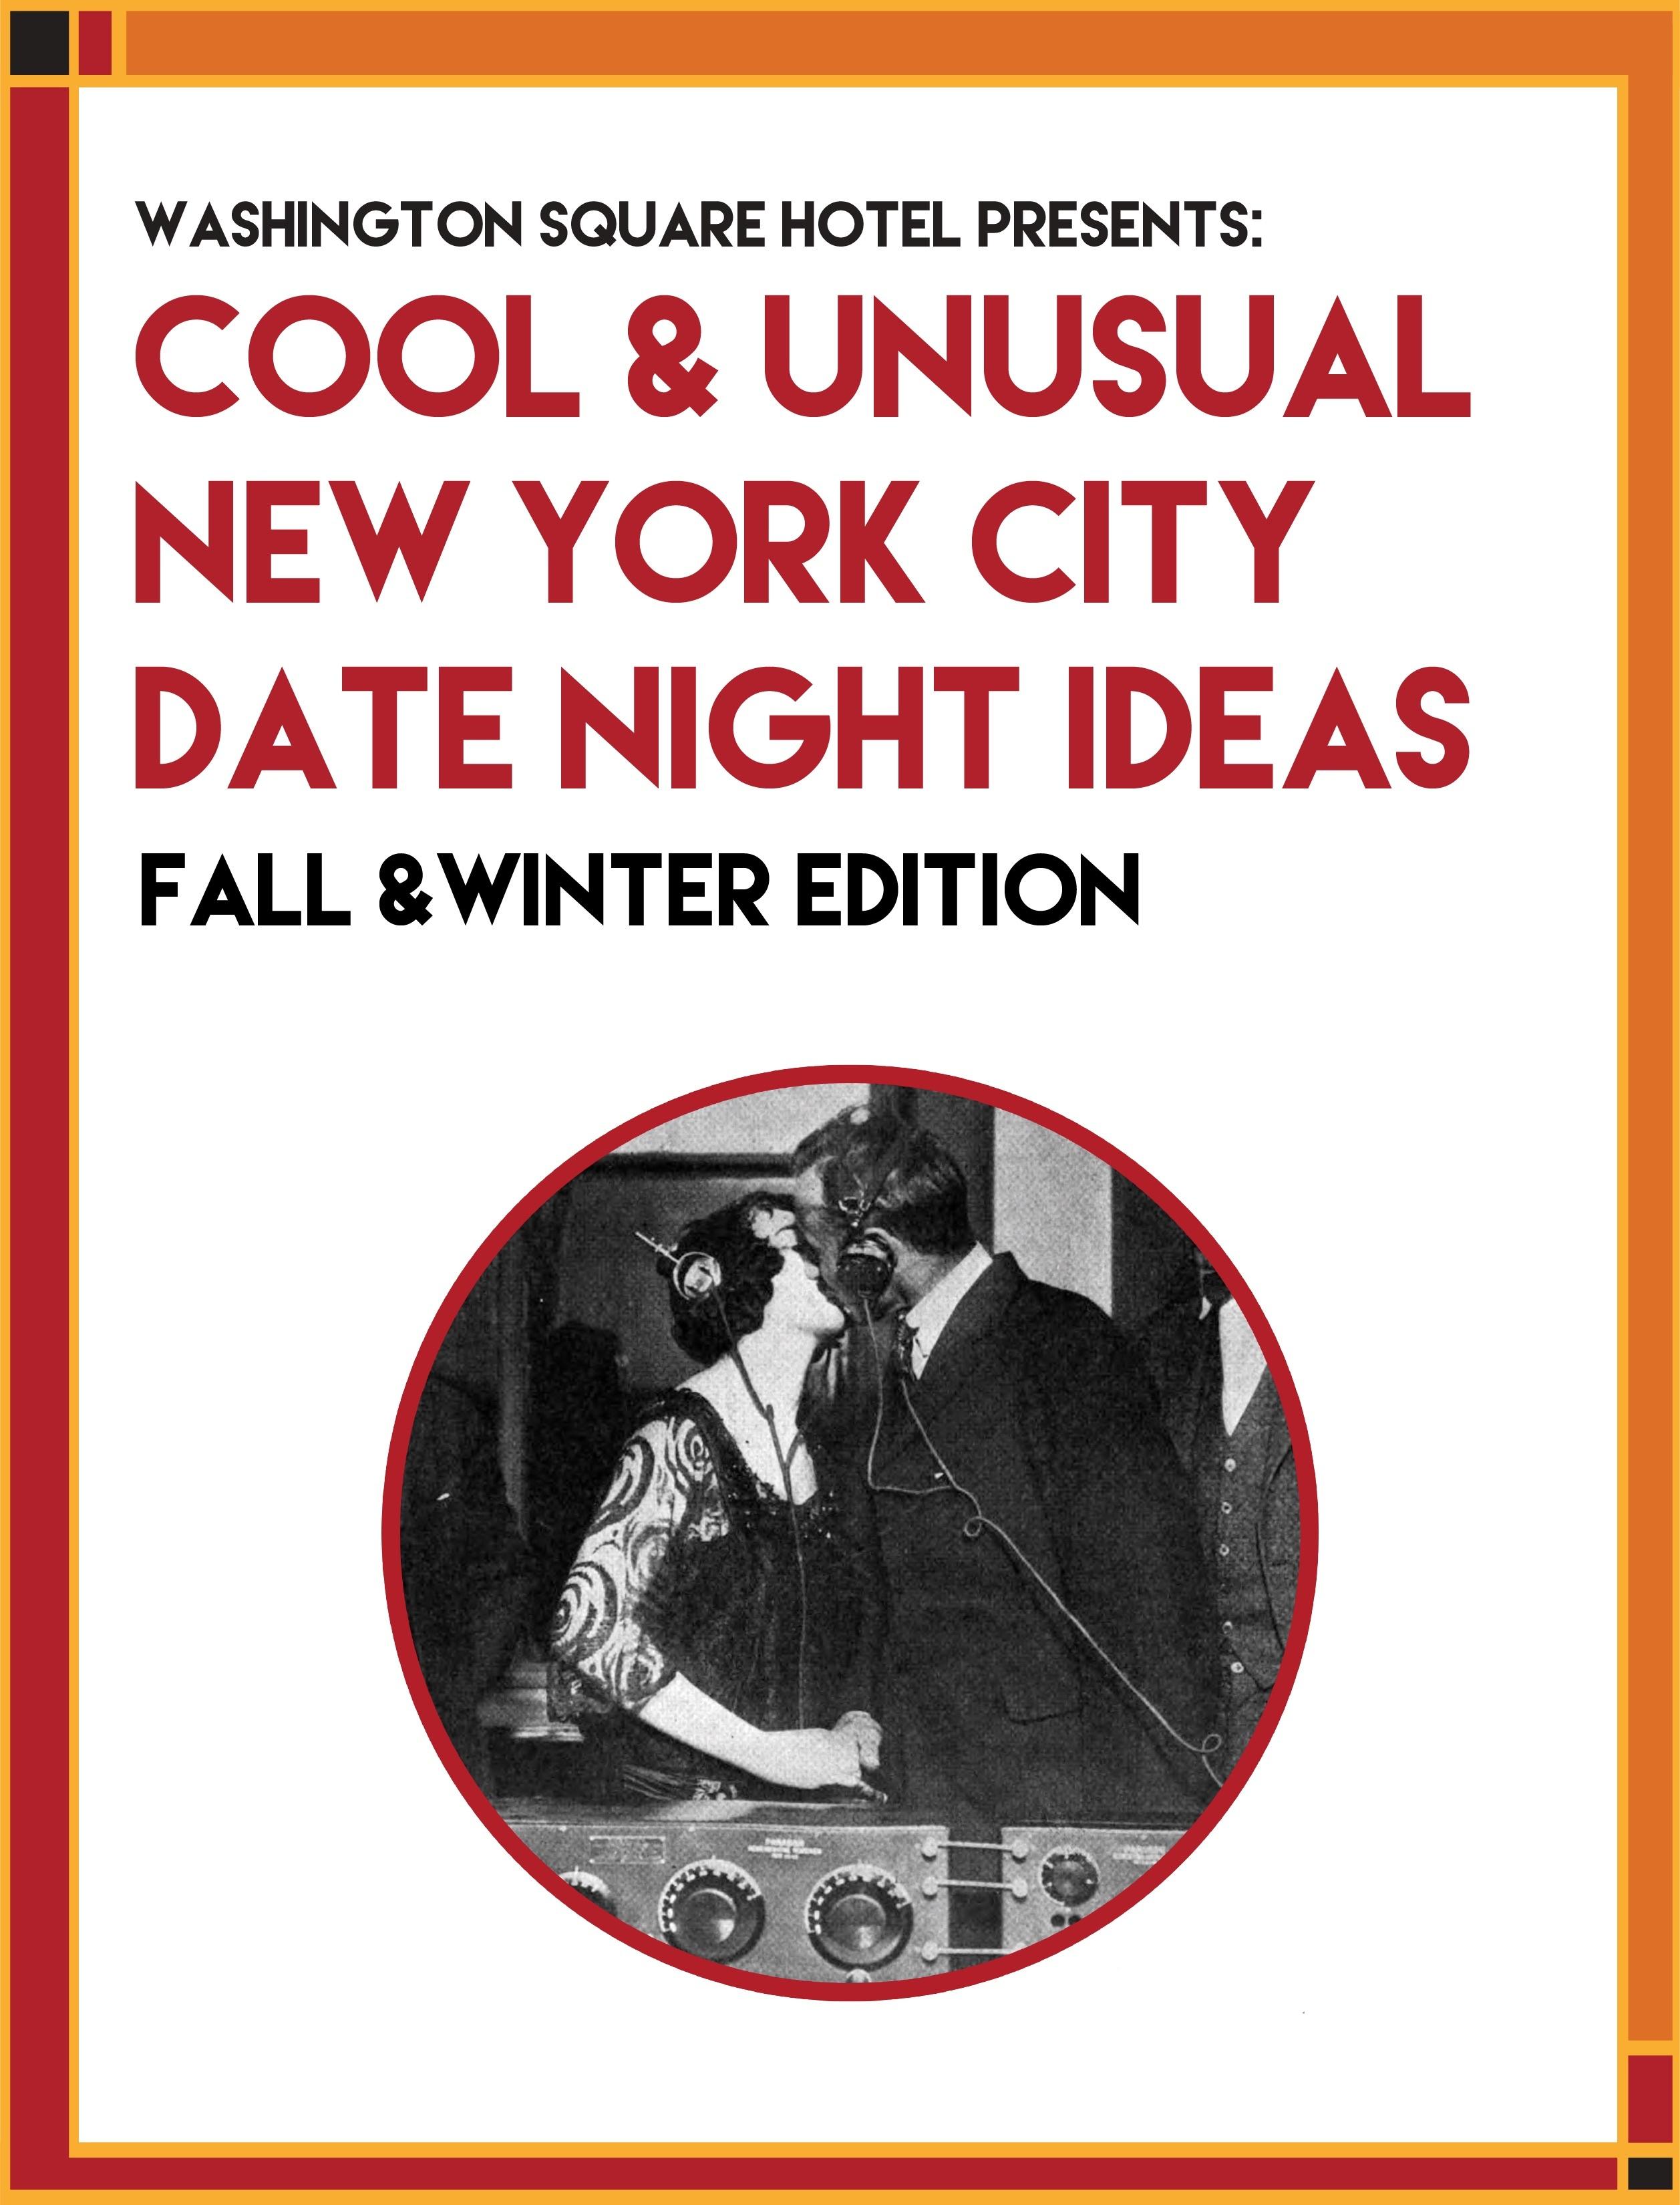 Fall-Winter-Date-Ideas-Cover-jpeg.jpg